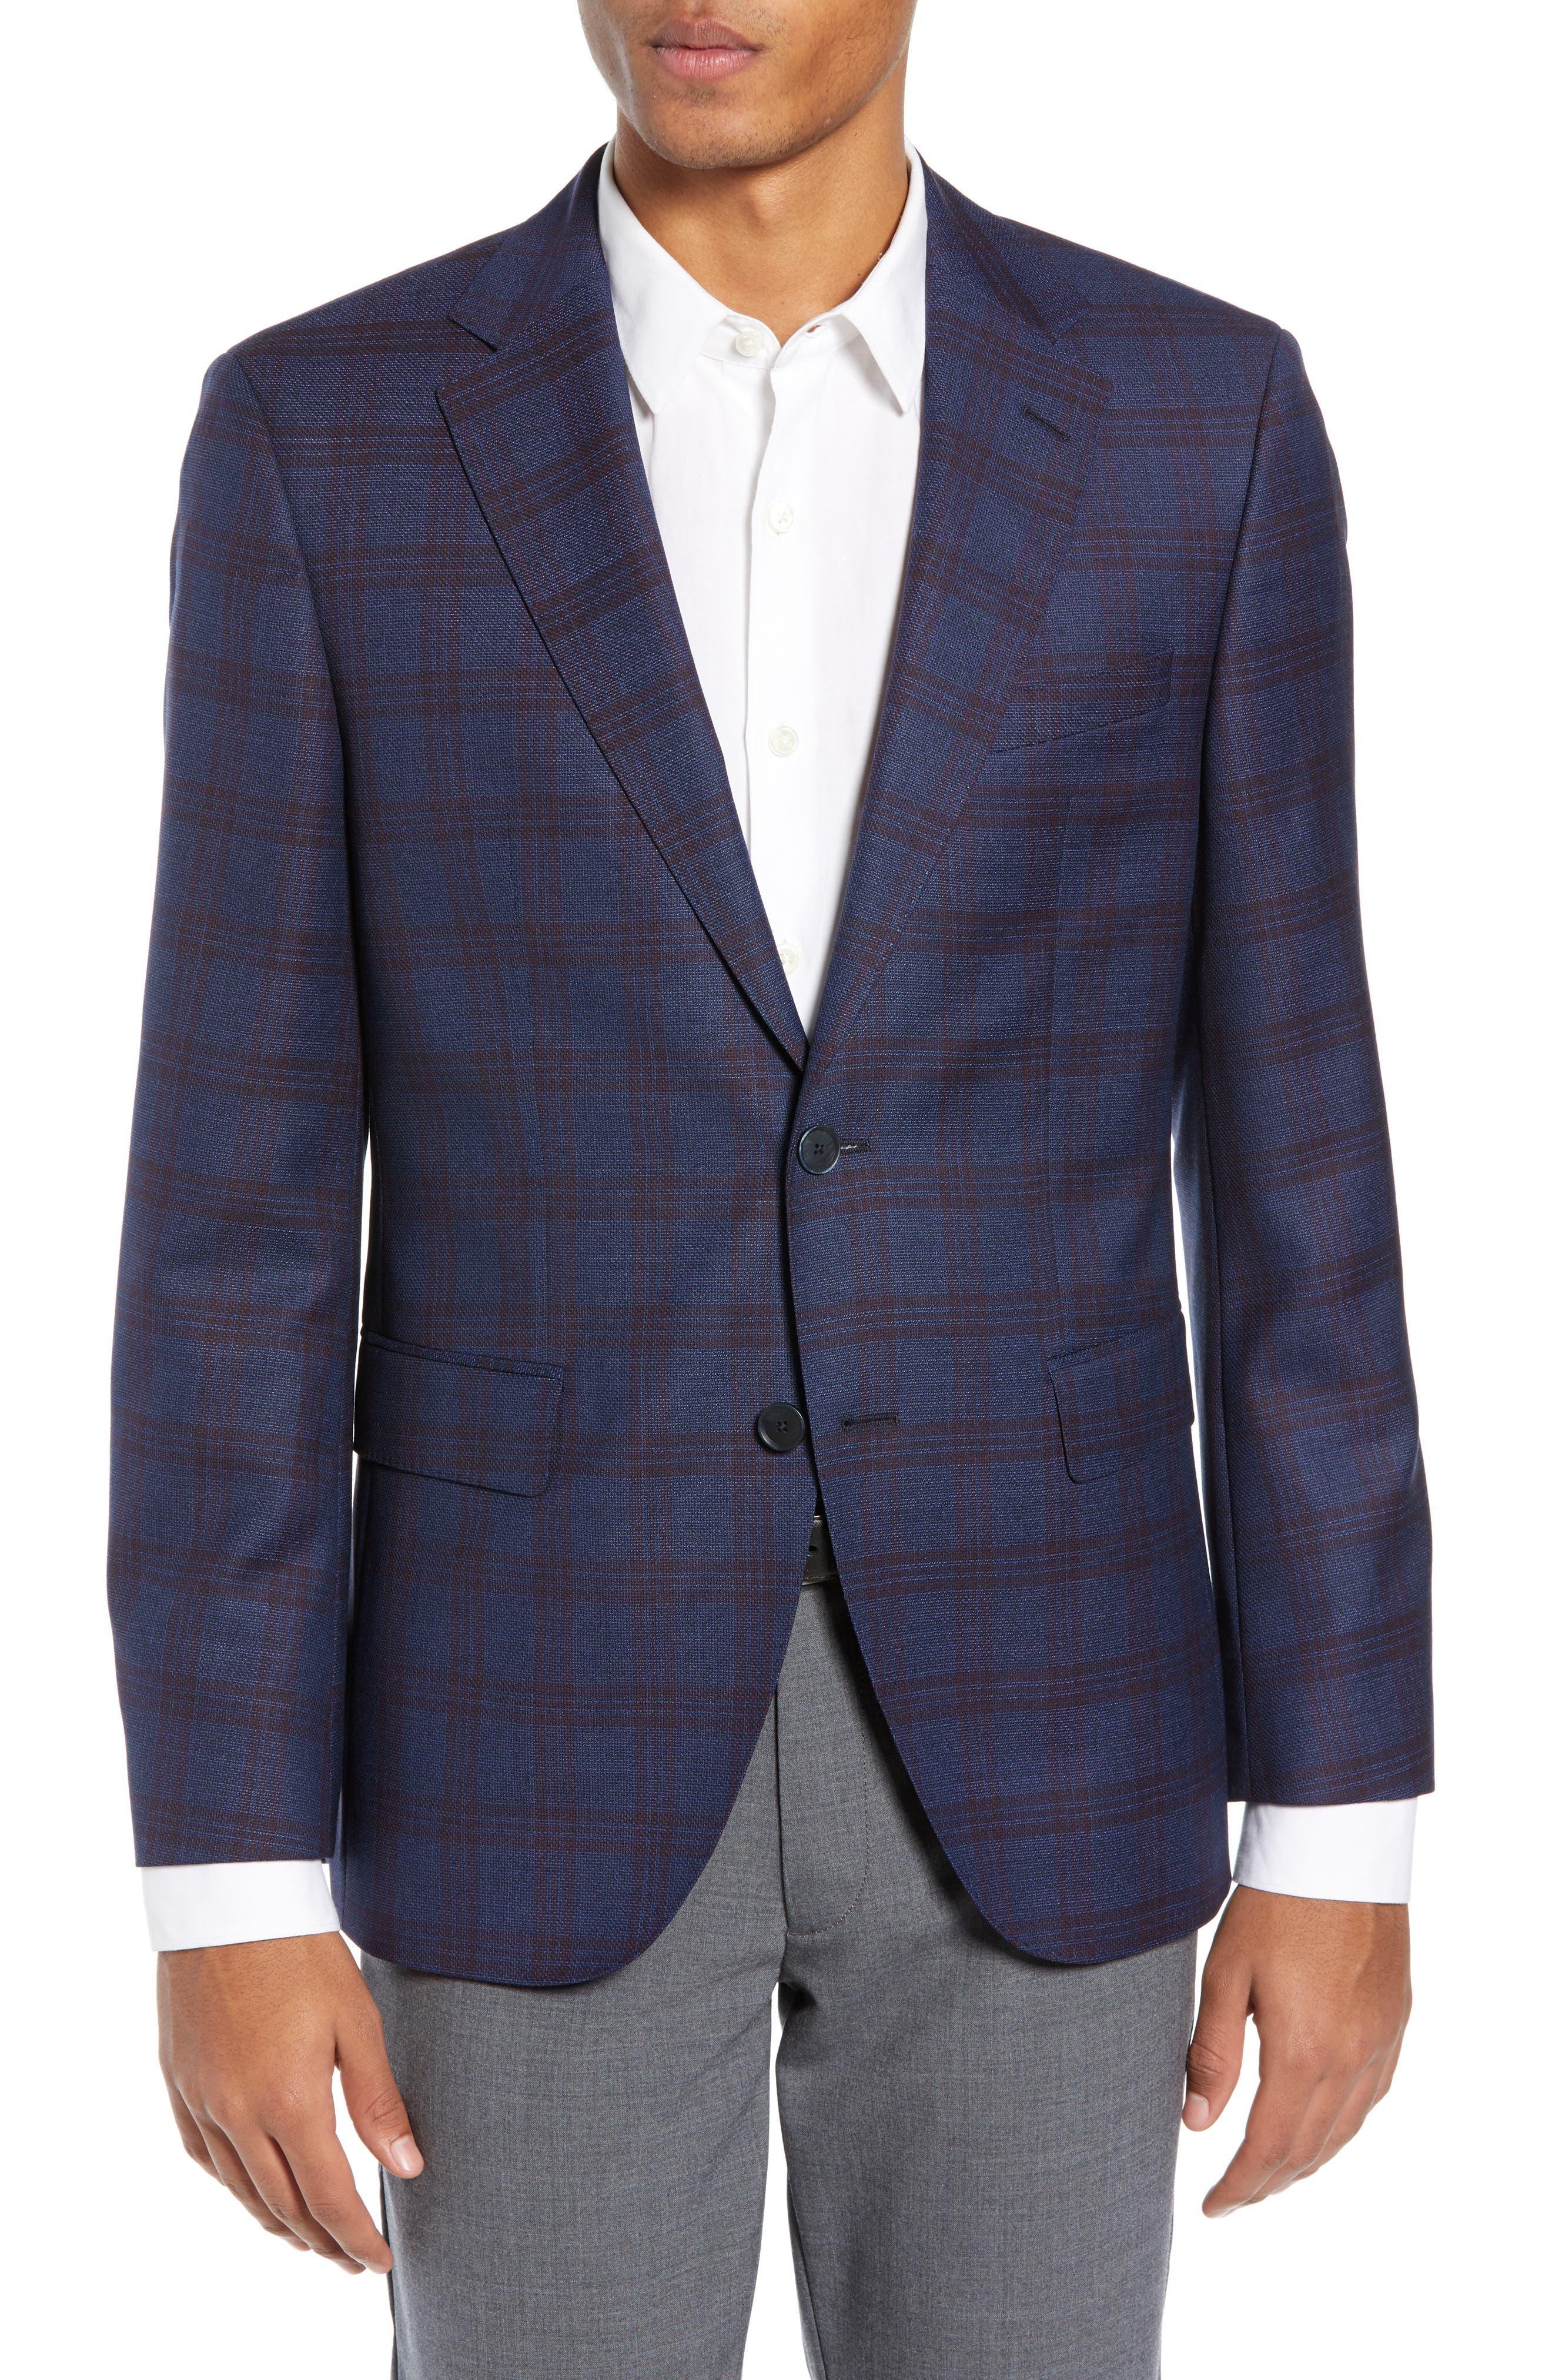 Jewels Classic Fit Plaid Wool Sport Coat, Main, color, OPEN BLUE